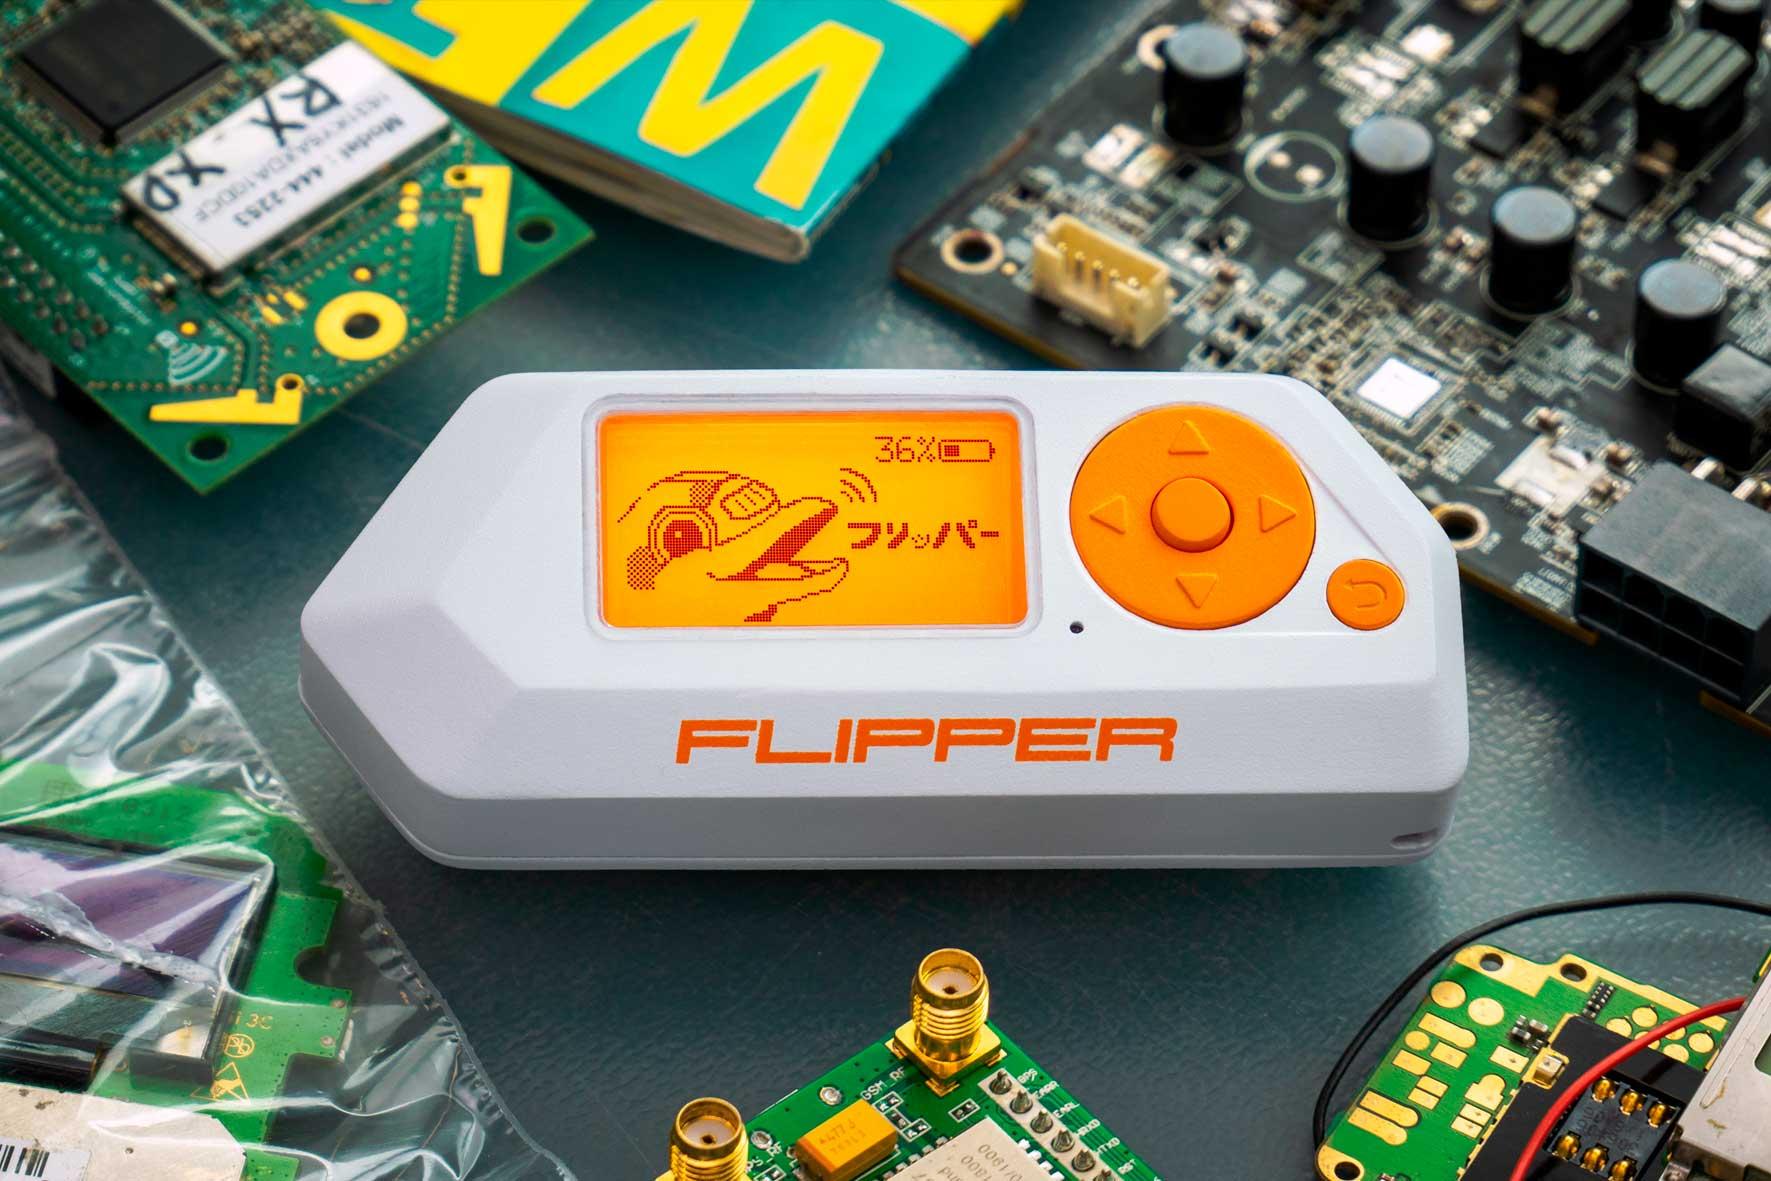 Hablamos de Flipper Zero, el tamagotchi para hacer hacking ético, en L'Altra Ràdio